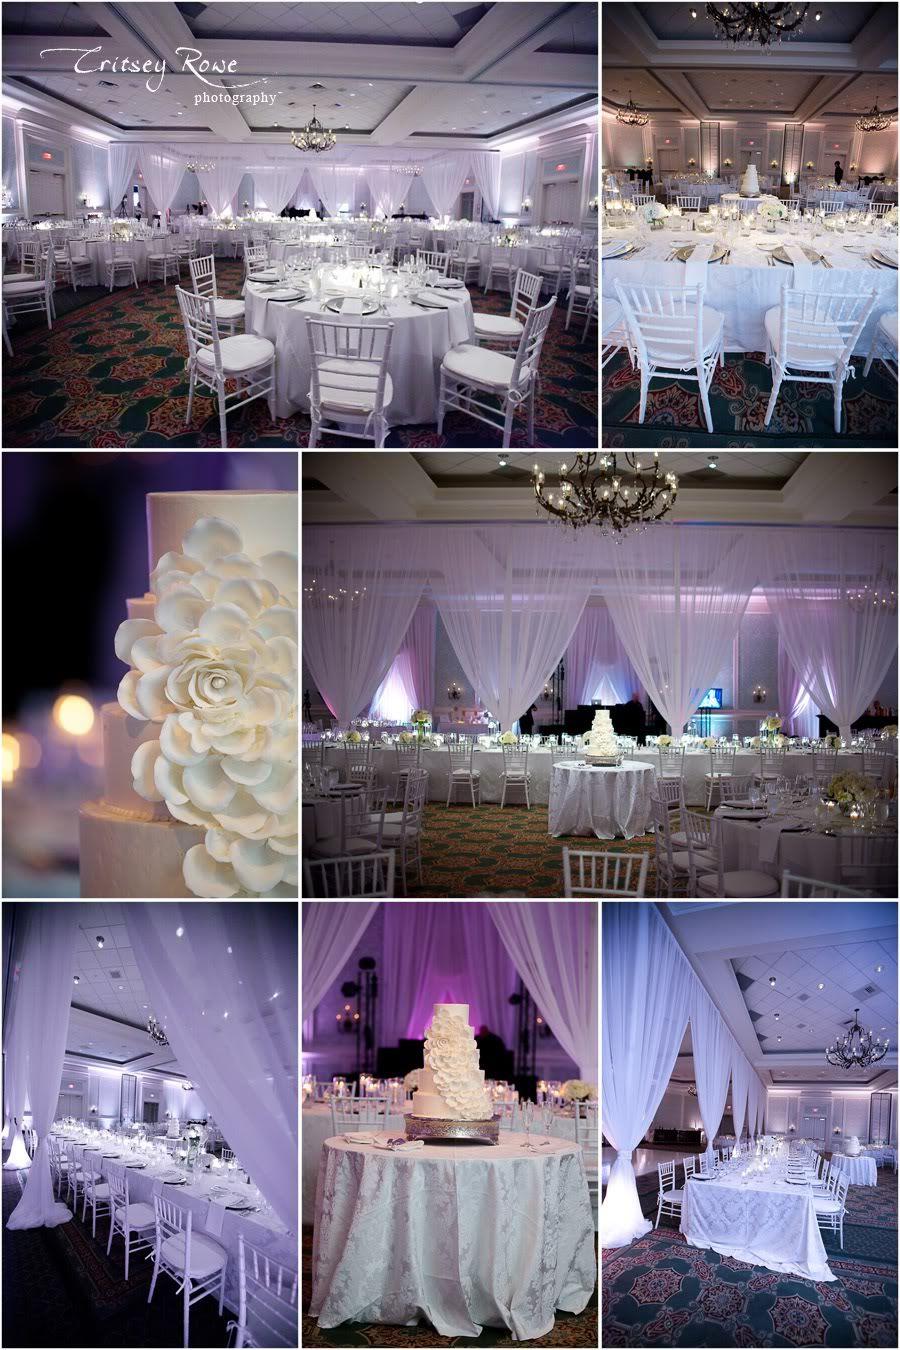 All White Wedding Reception Lighting And Draping Charlotte Planner Ballantyne Hotel